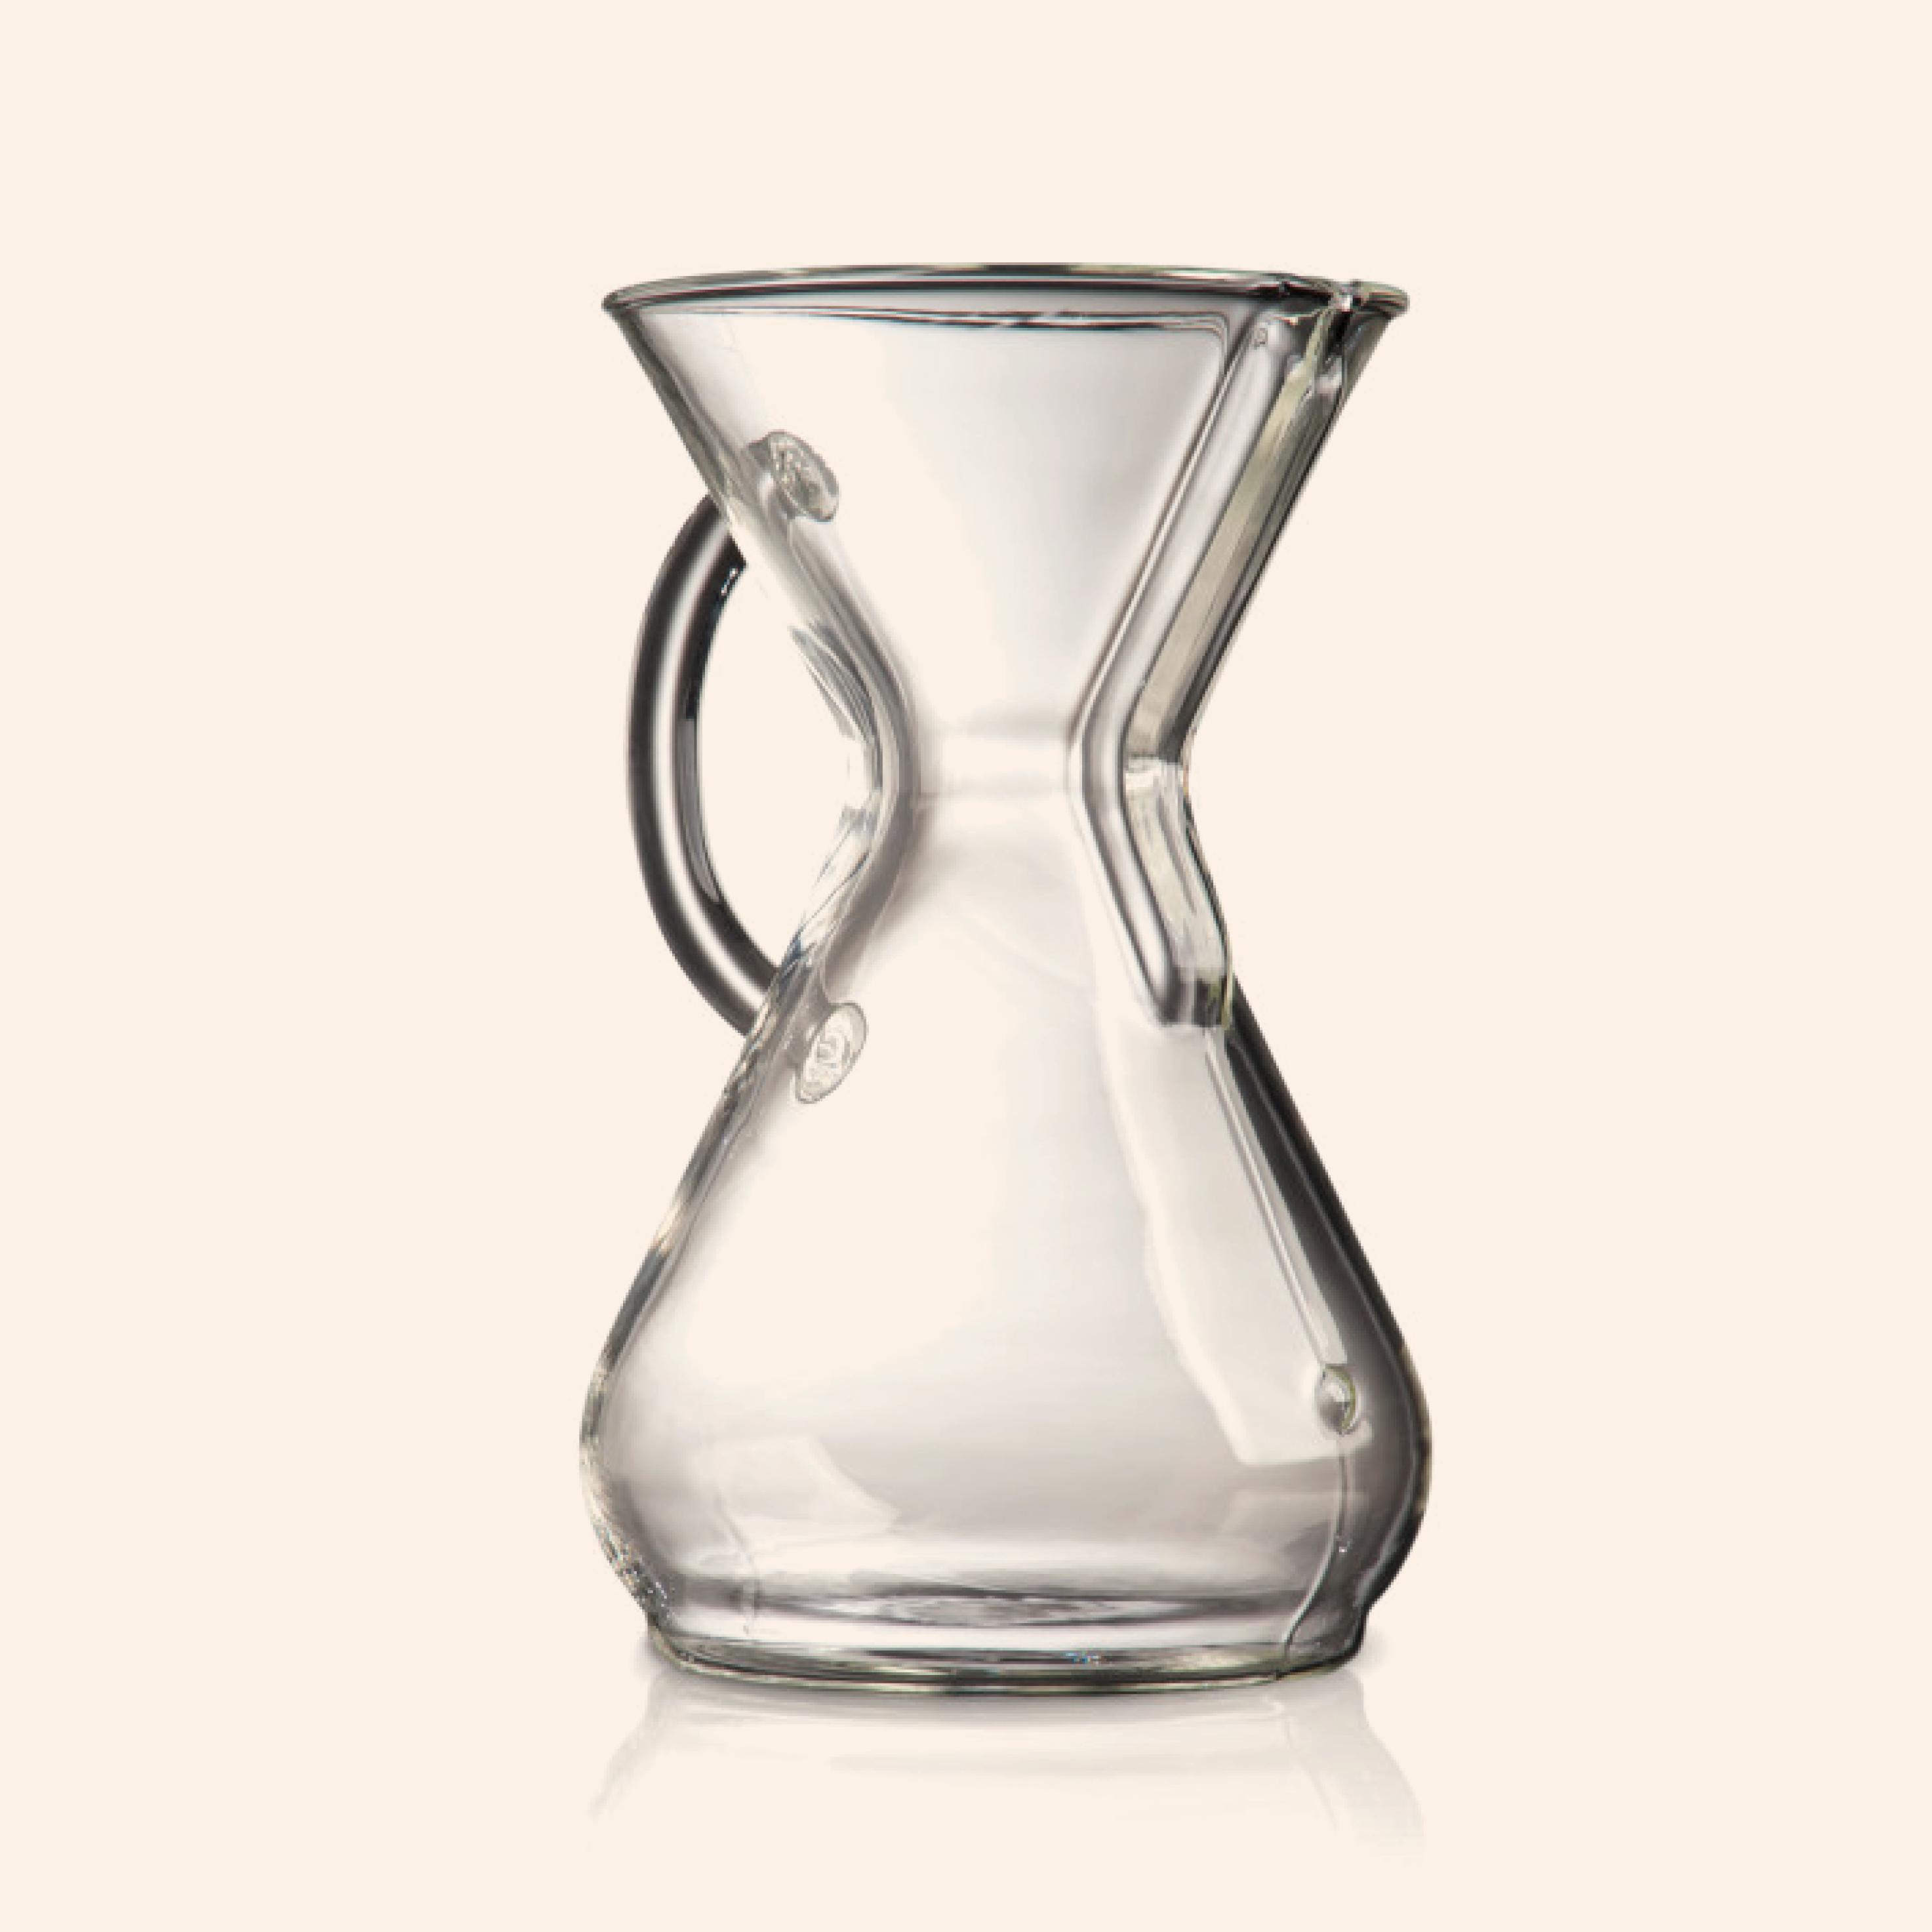 Chemex 8-Cup Glass